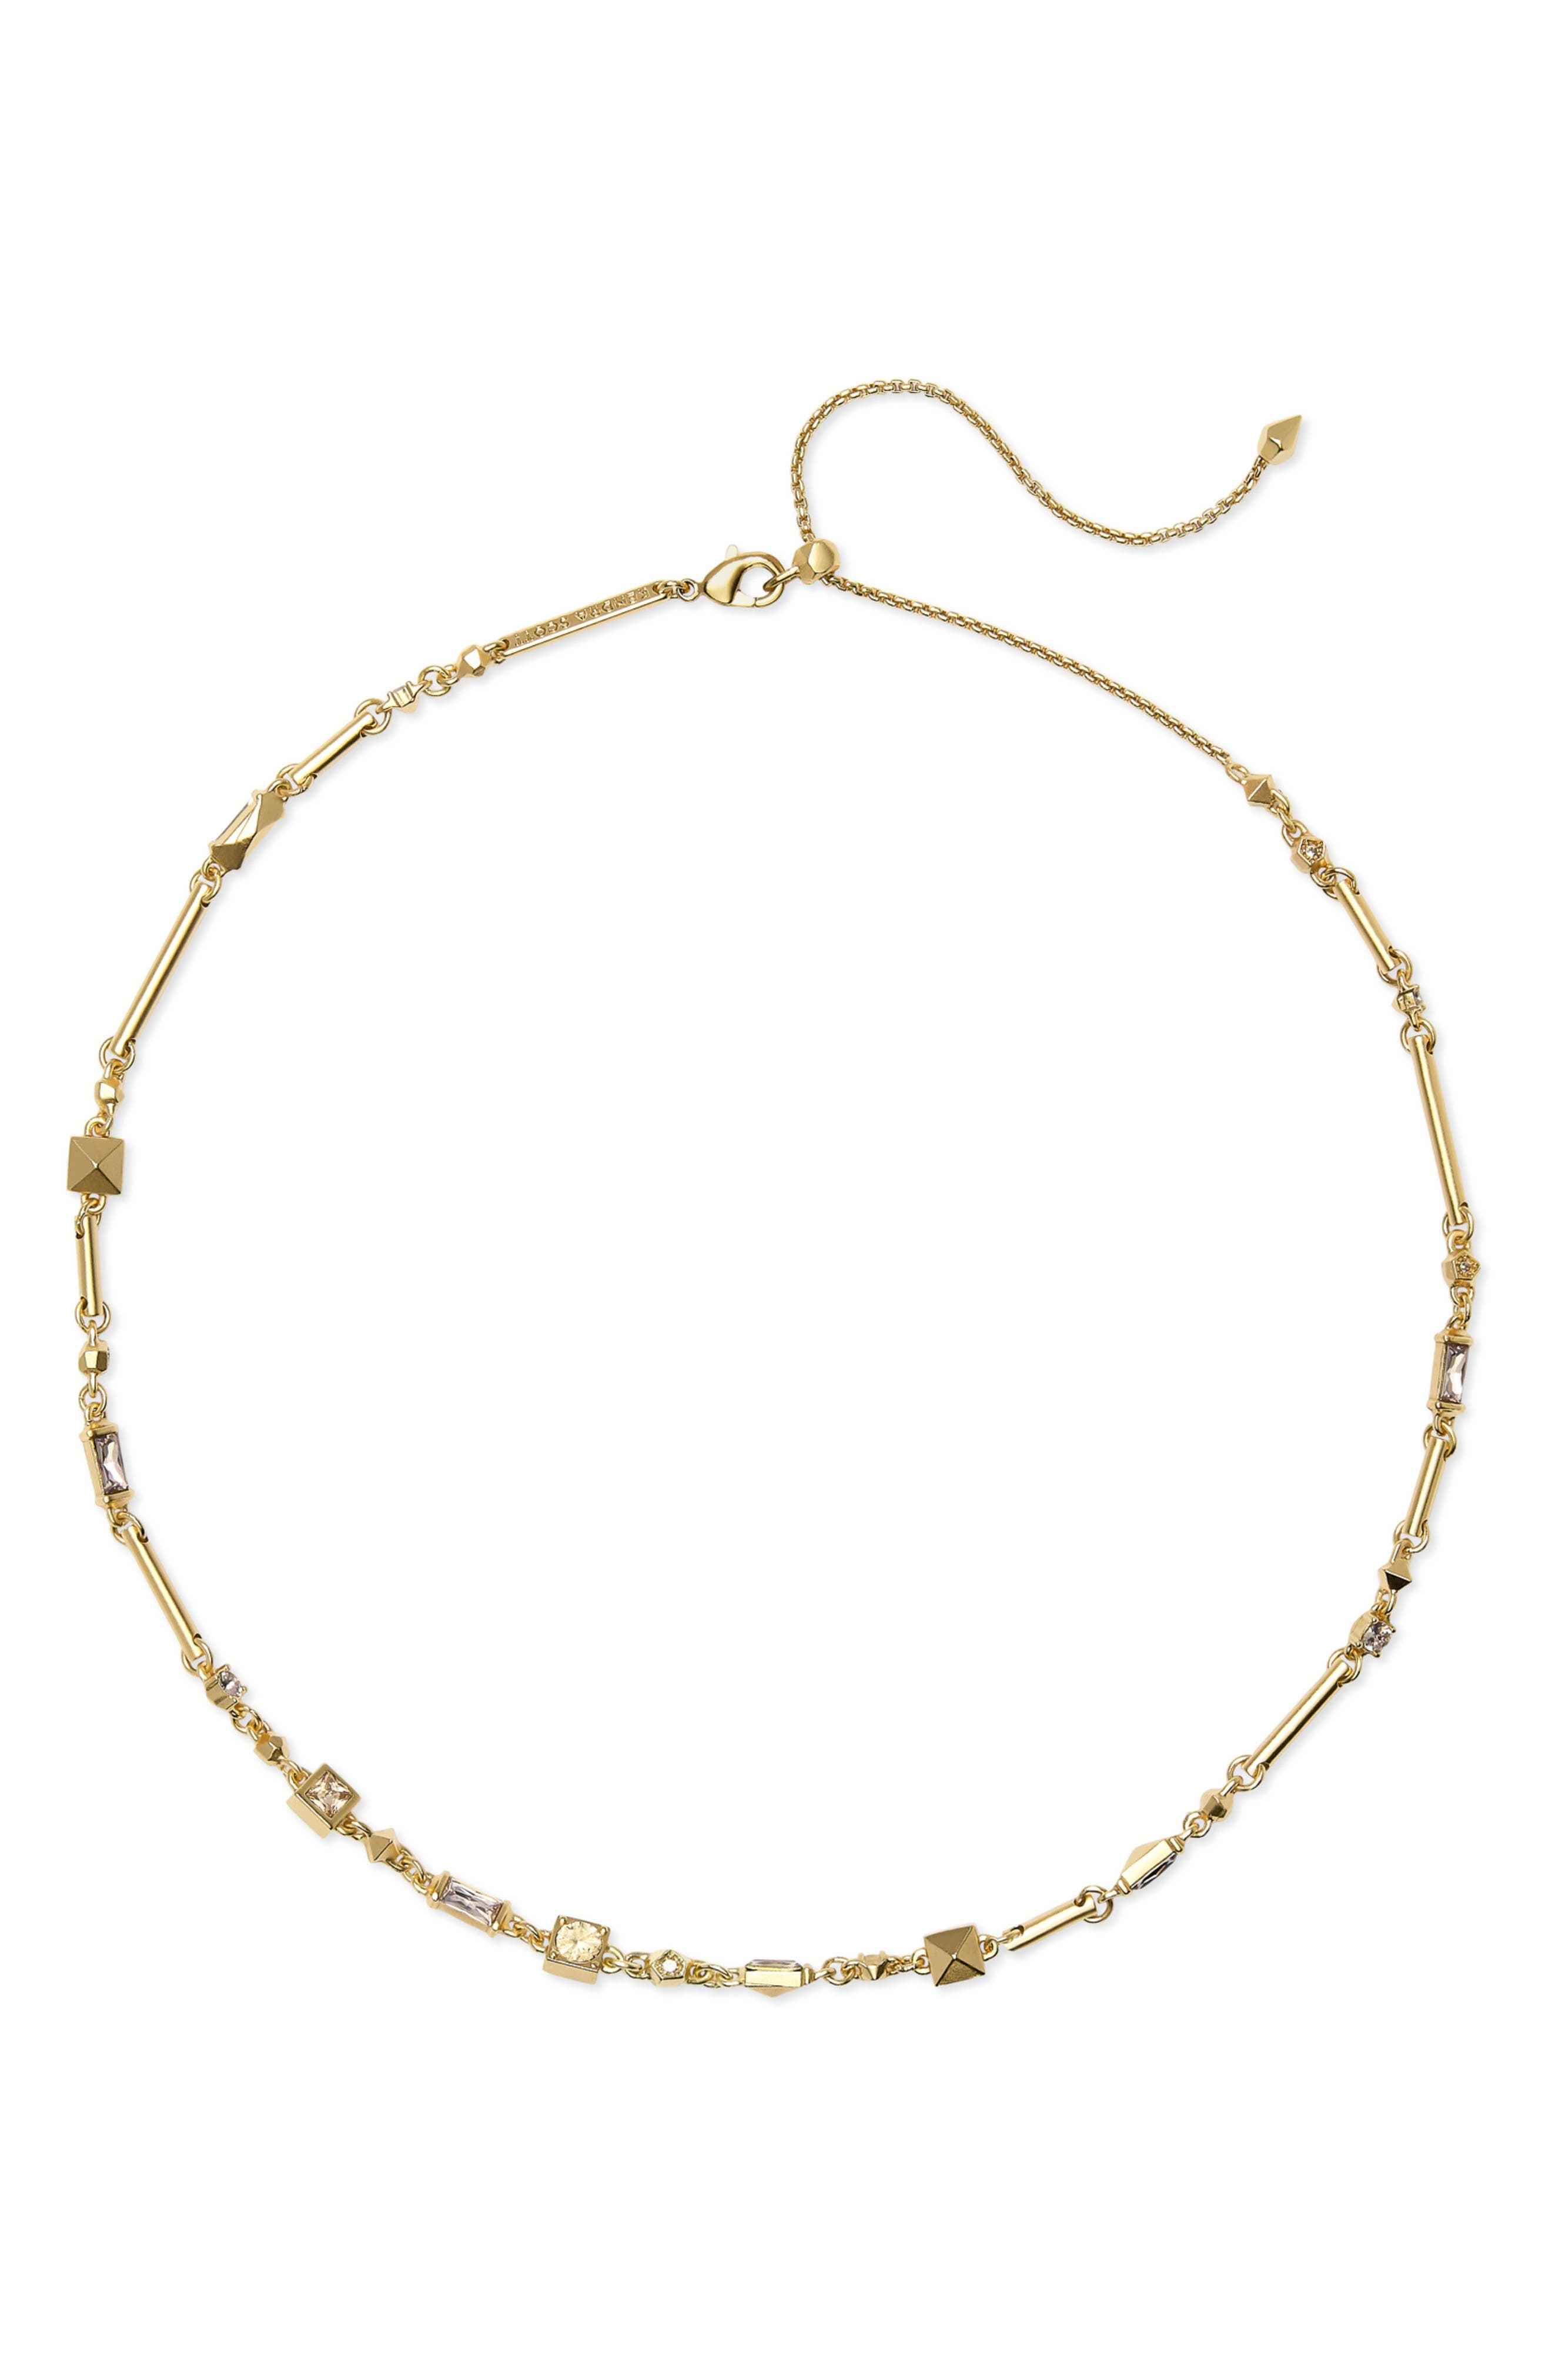 Rhett Collar Necklace,                             Main thumbnail 1, color,                             SMOKY MIX/ GOLD